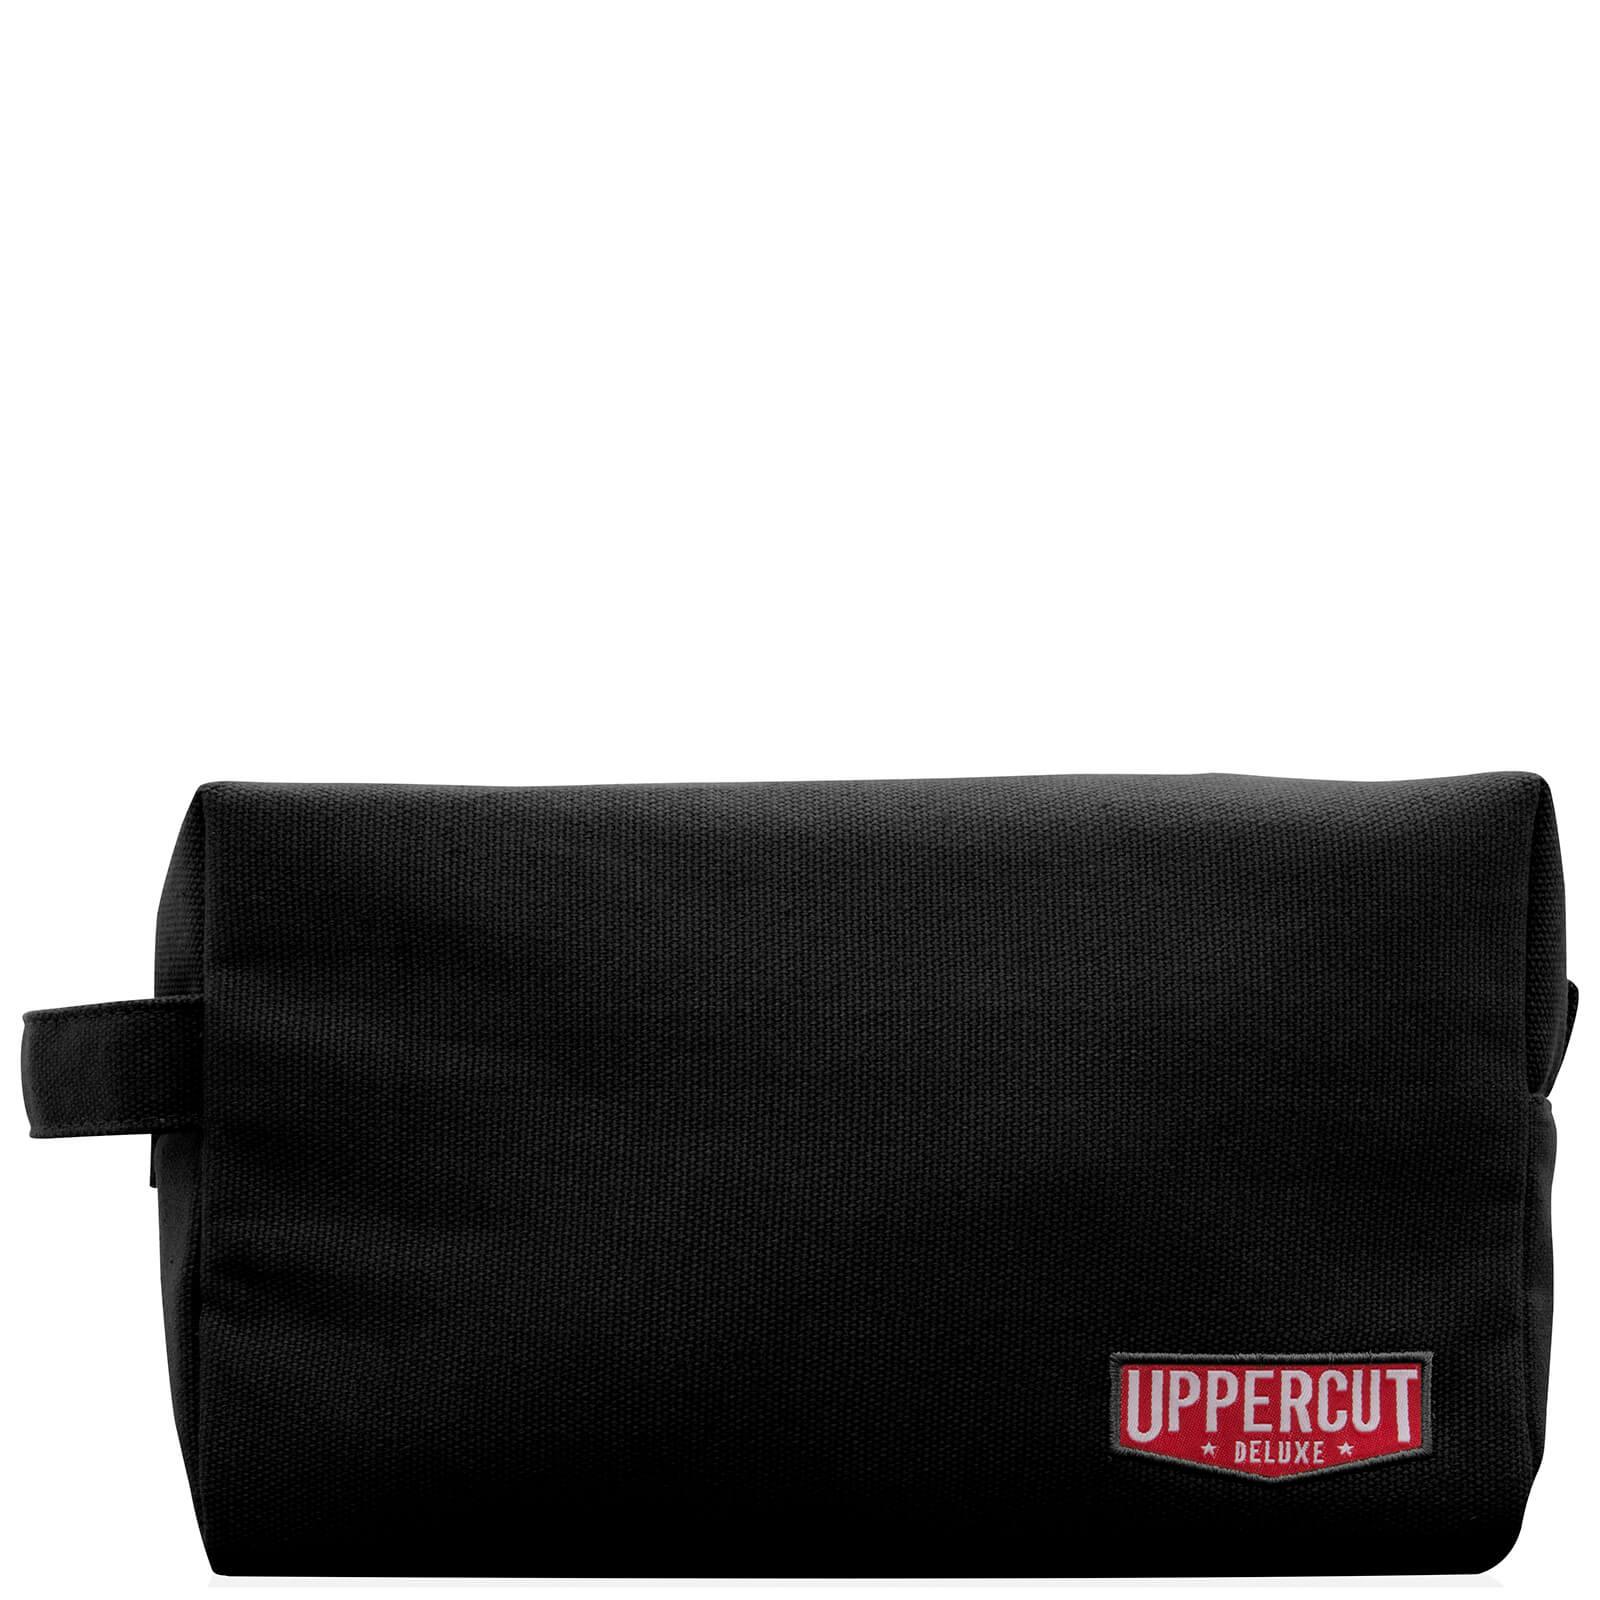 28a89b1e0aa6 Uppercut Deluxe Wash Bag - Black